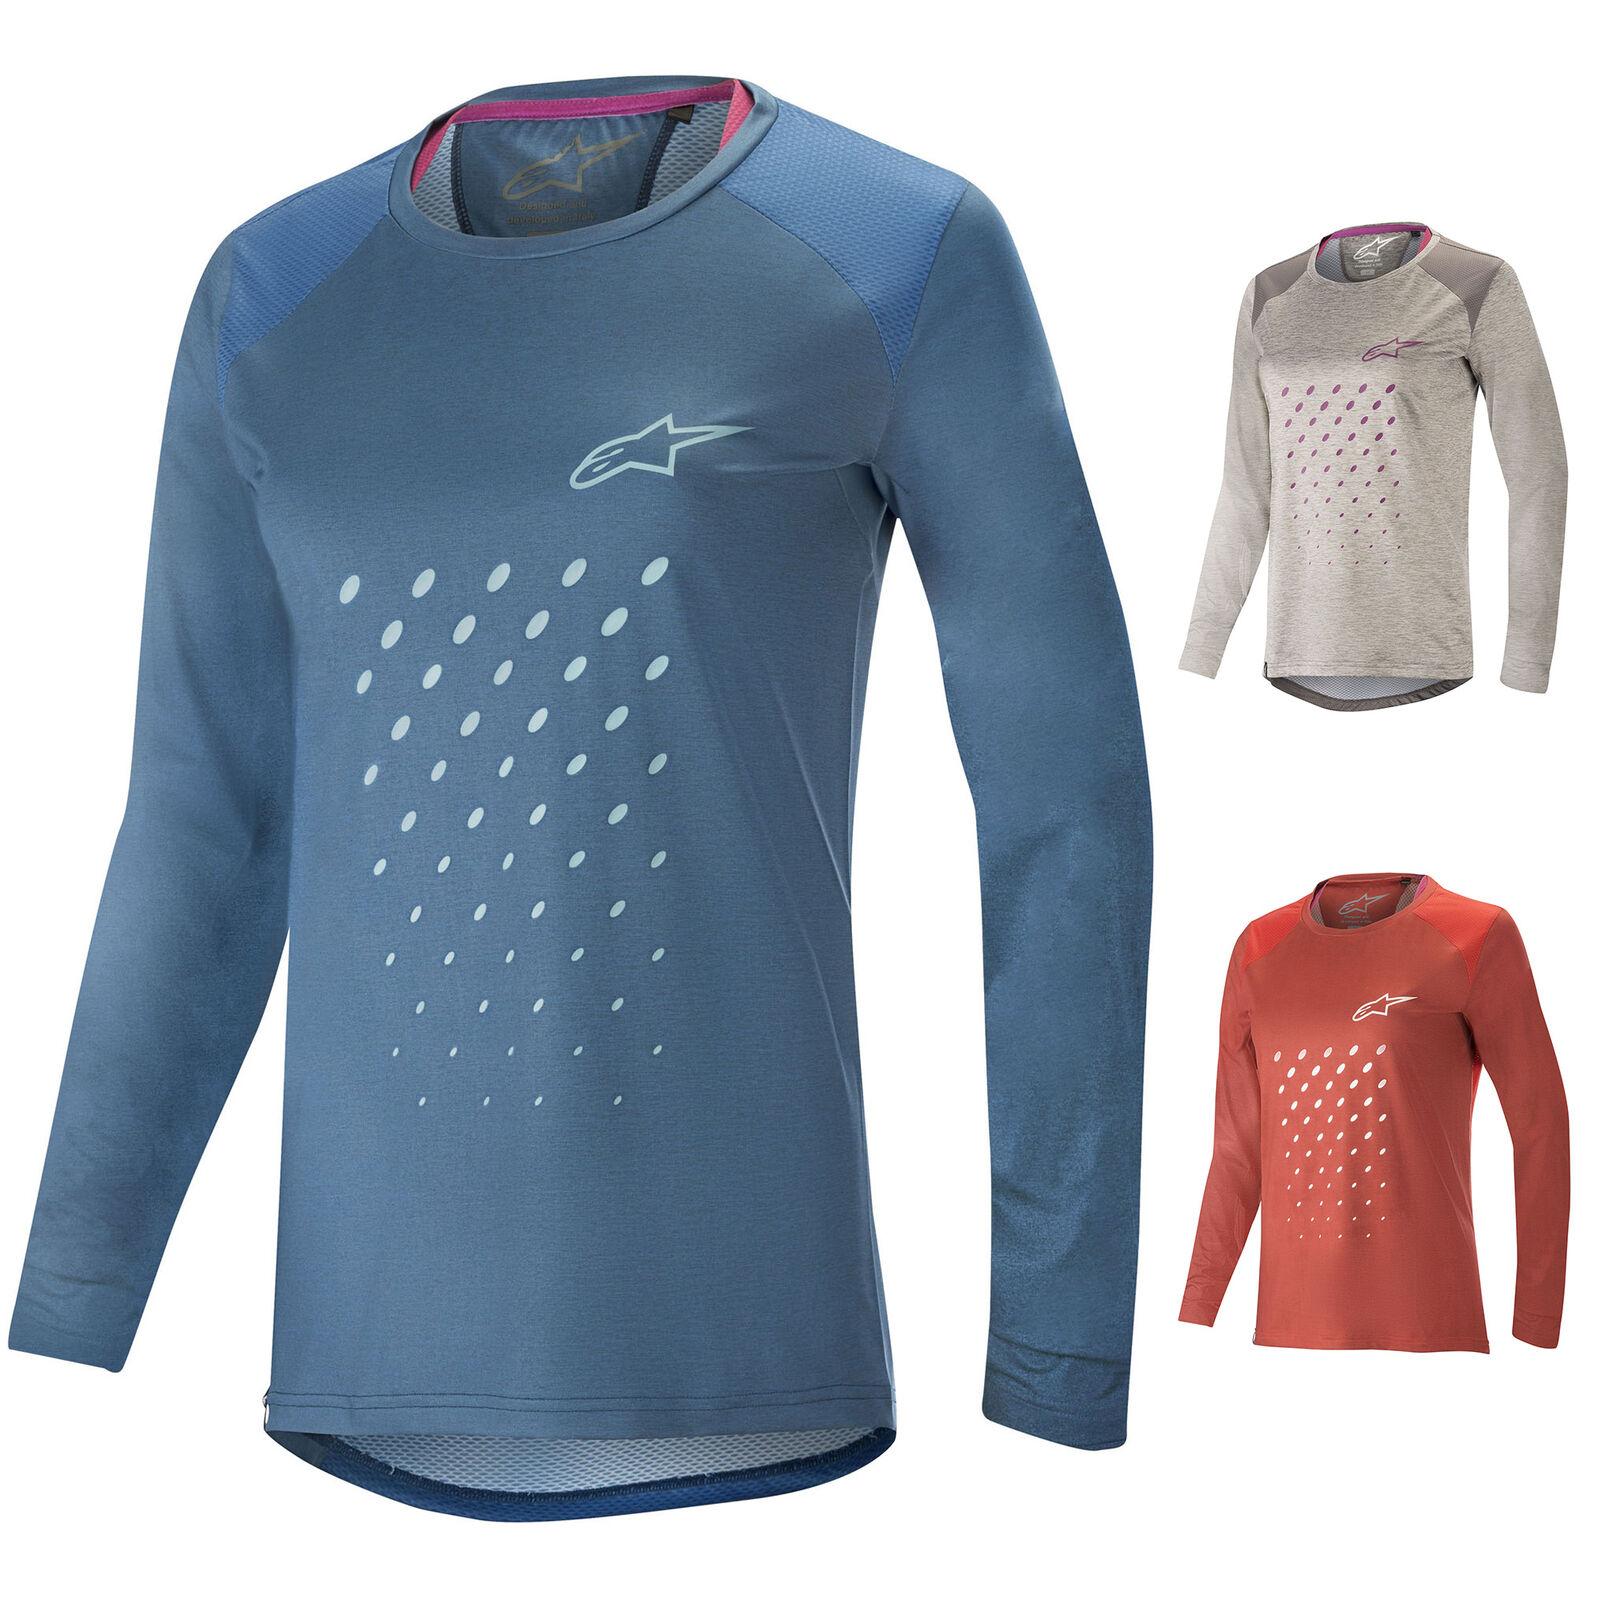 1783819 Alpinestars STELLA ALPS 6.0 JERSEY Womens Ladies T-Shirt Mountain Biking